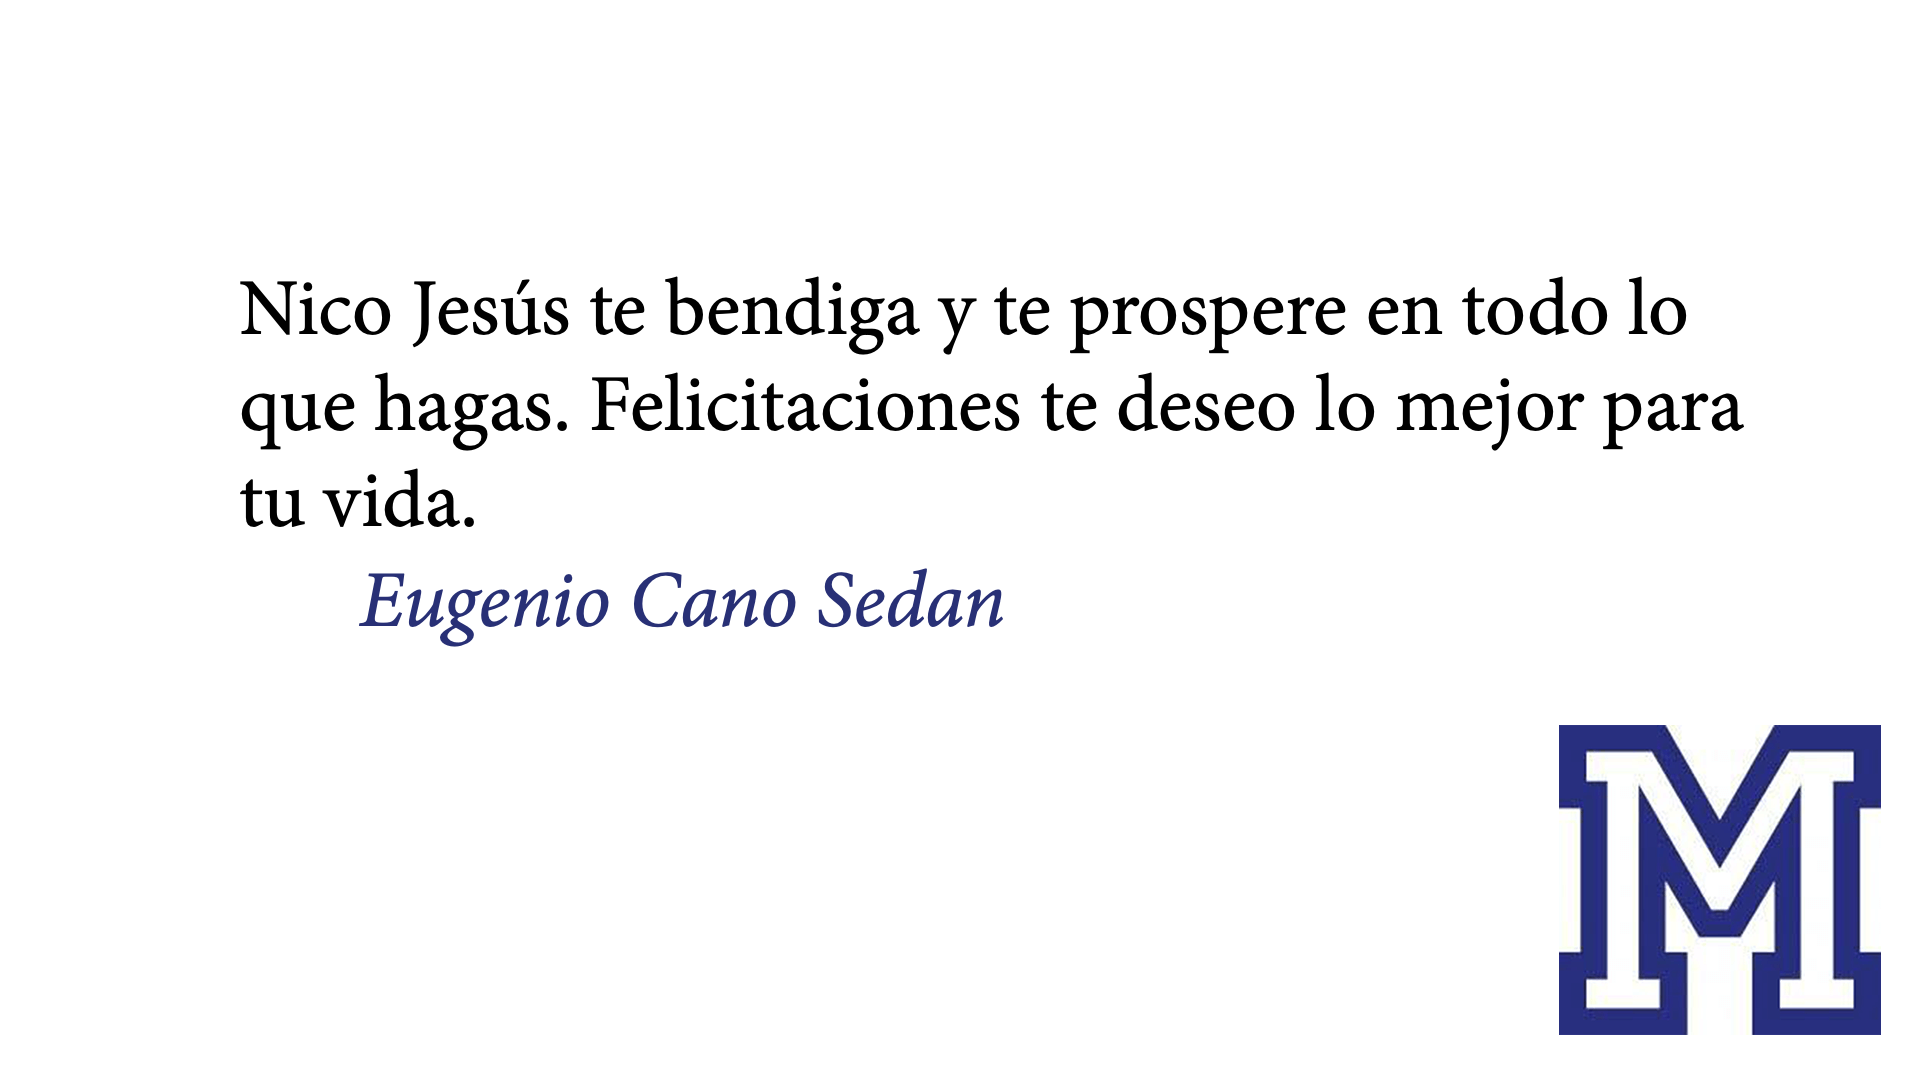 tbi_nicholas-urquijo_107.png